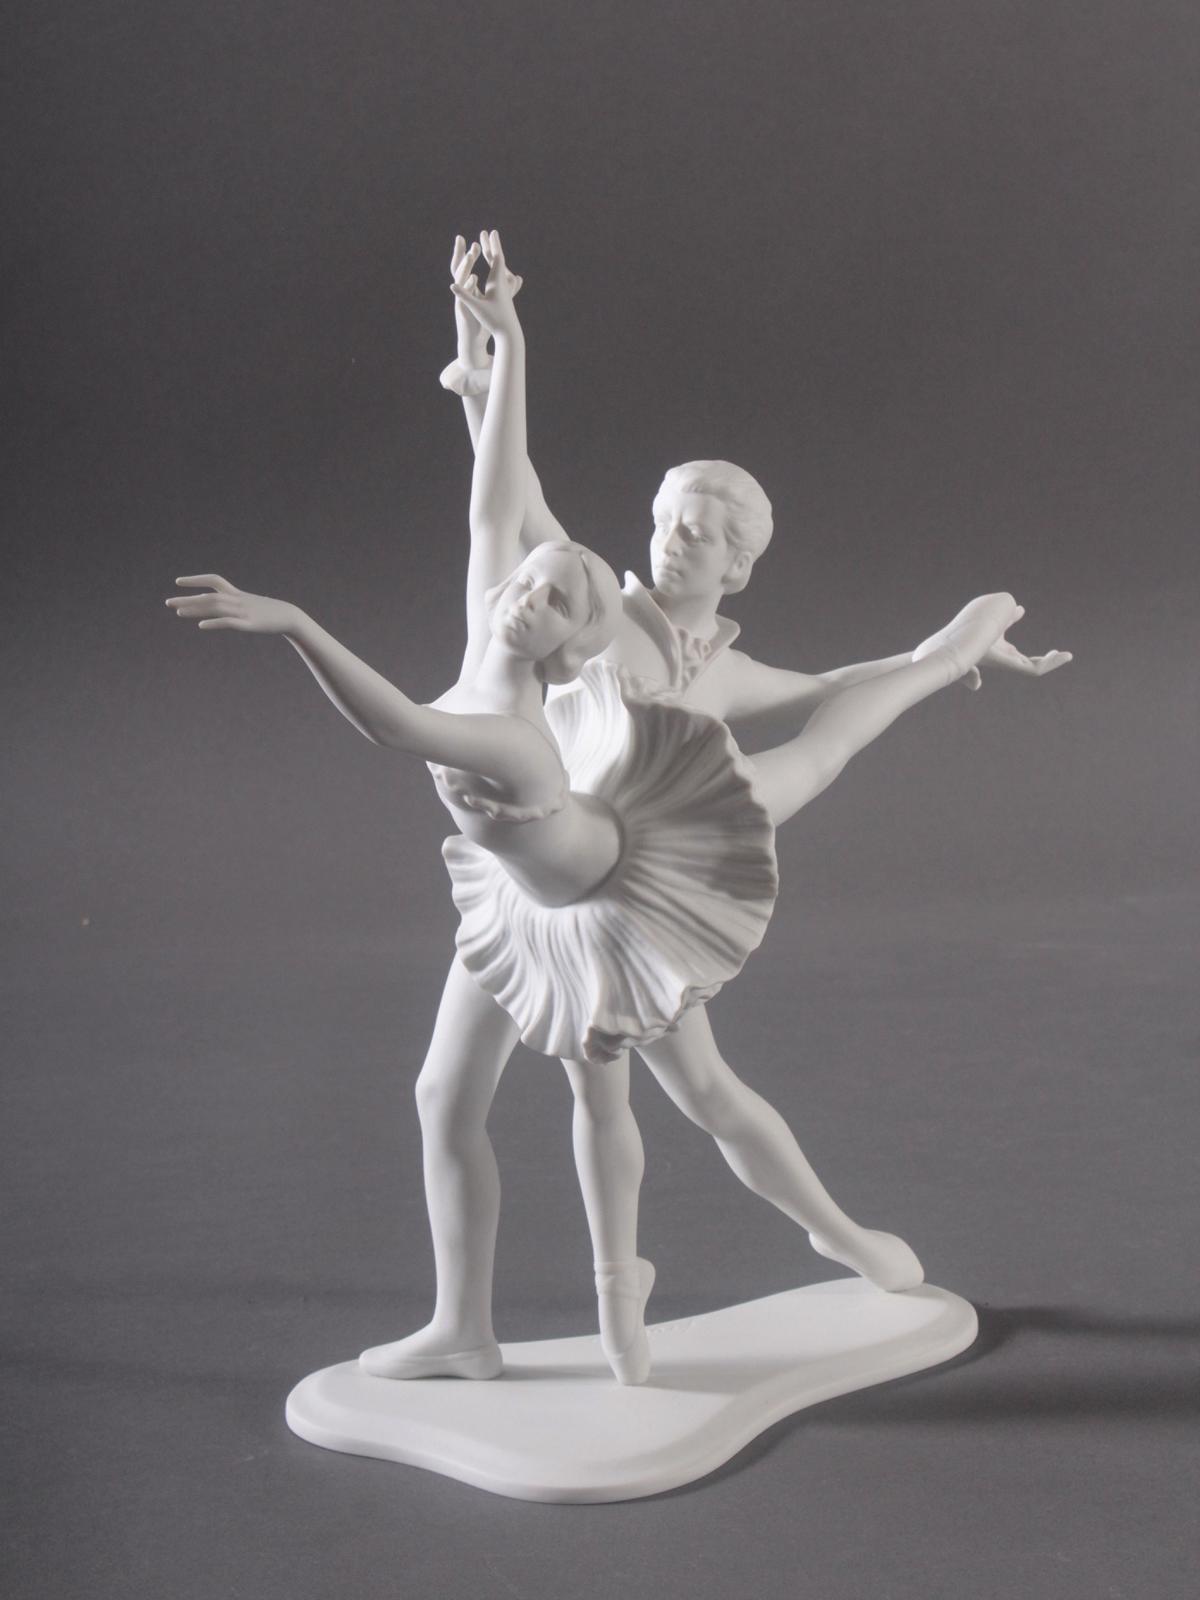 Goebel-Figur, 'Tanzendes Paar', 20. Jahrhundert-2